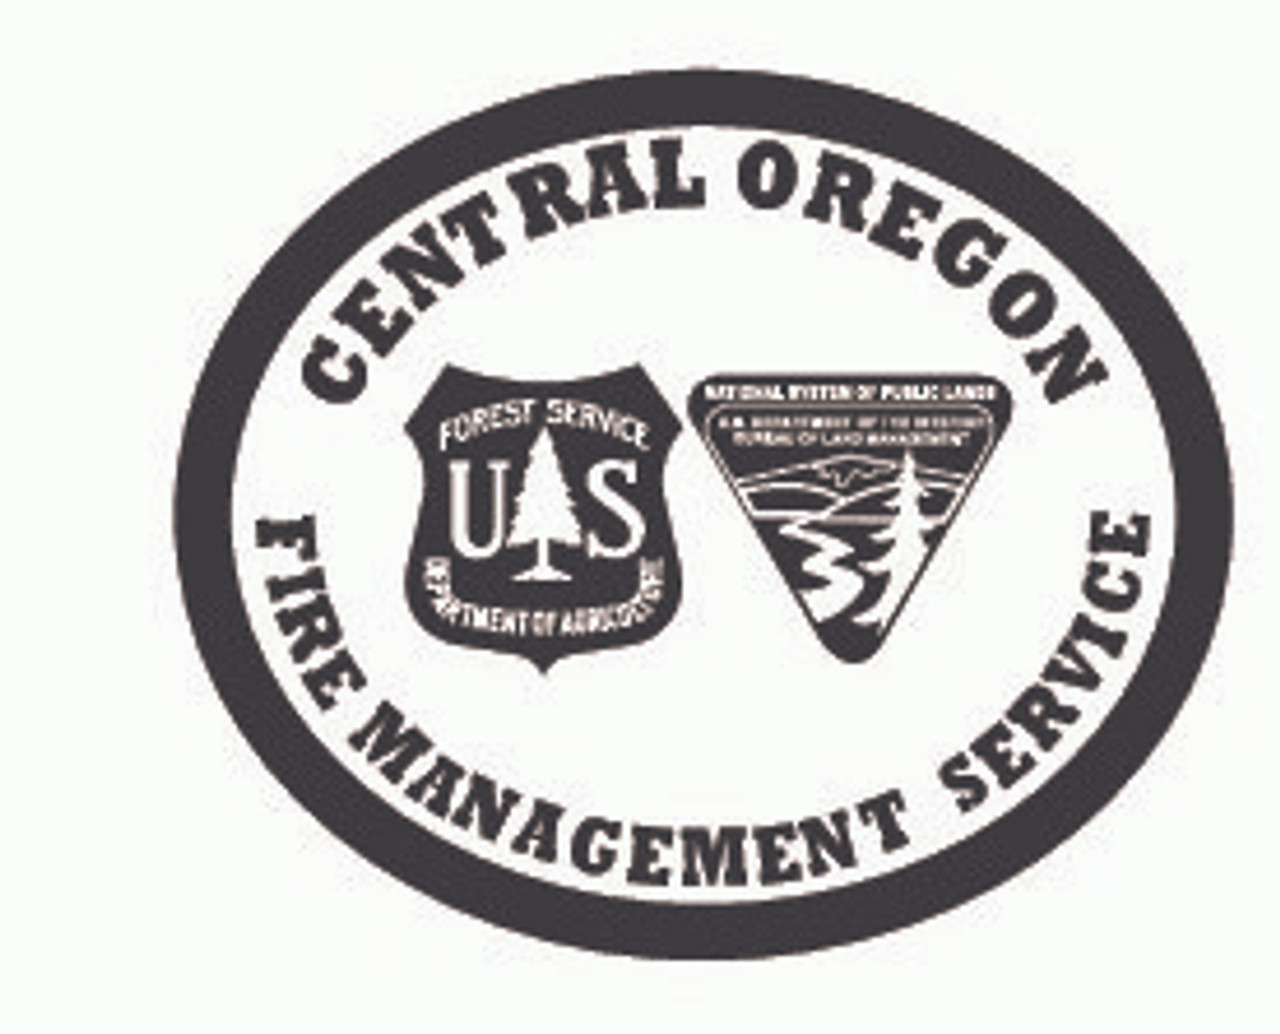 Central Oregon Fire Management Service Buckle